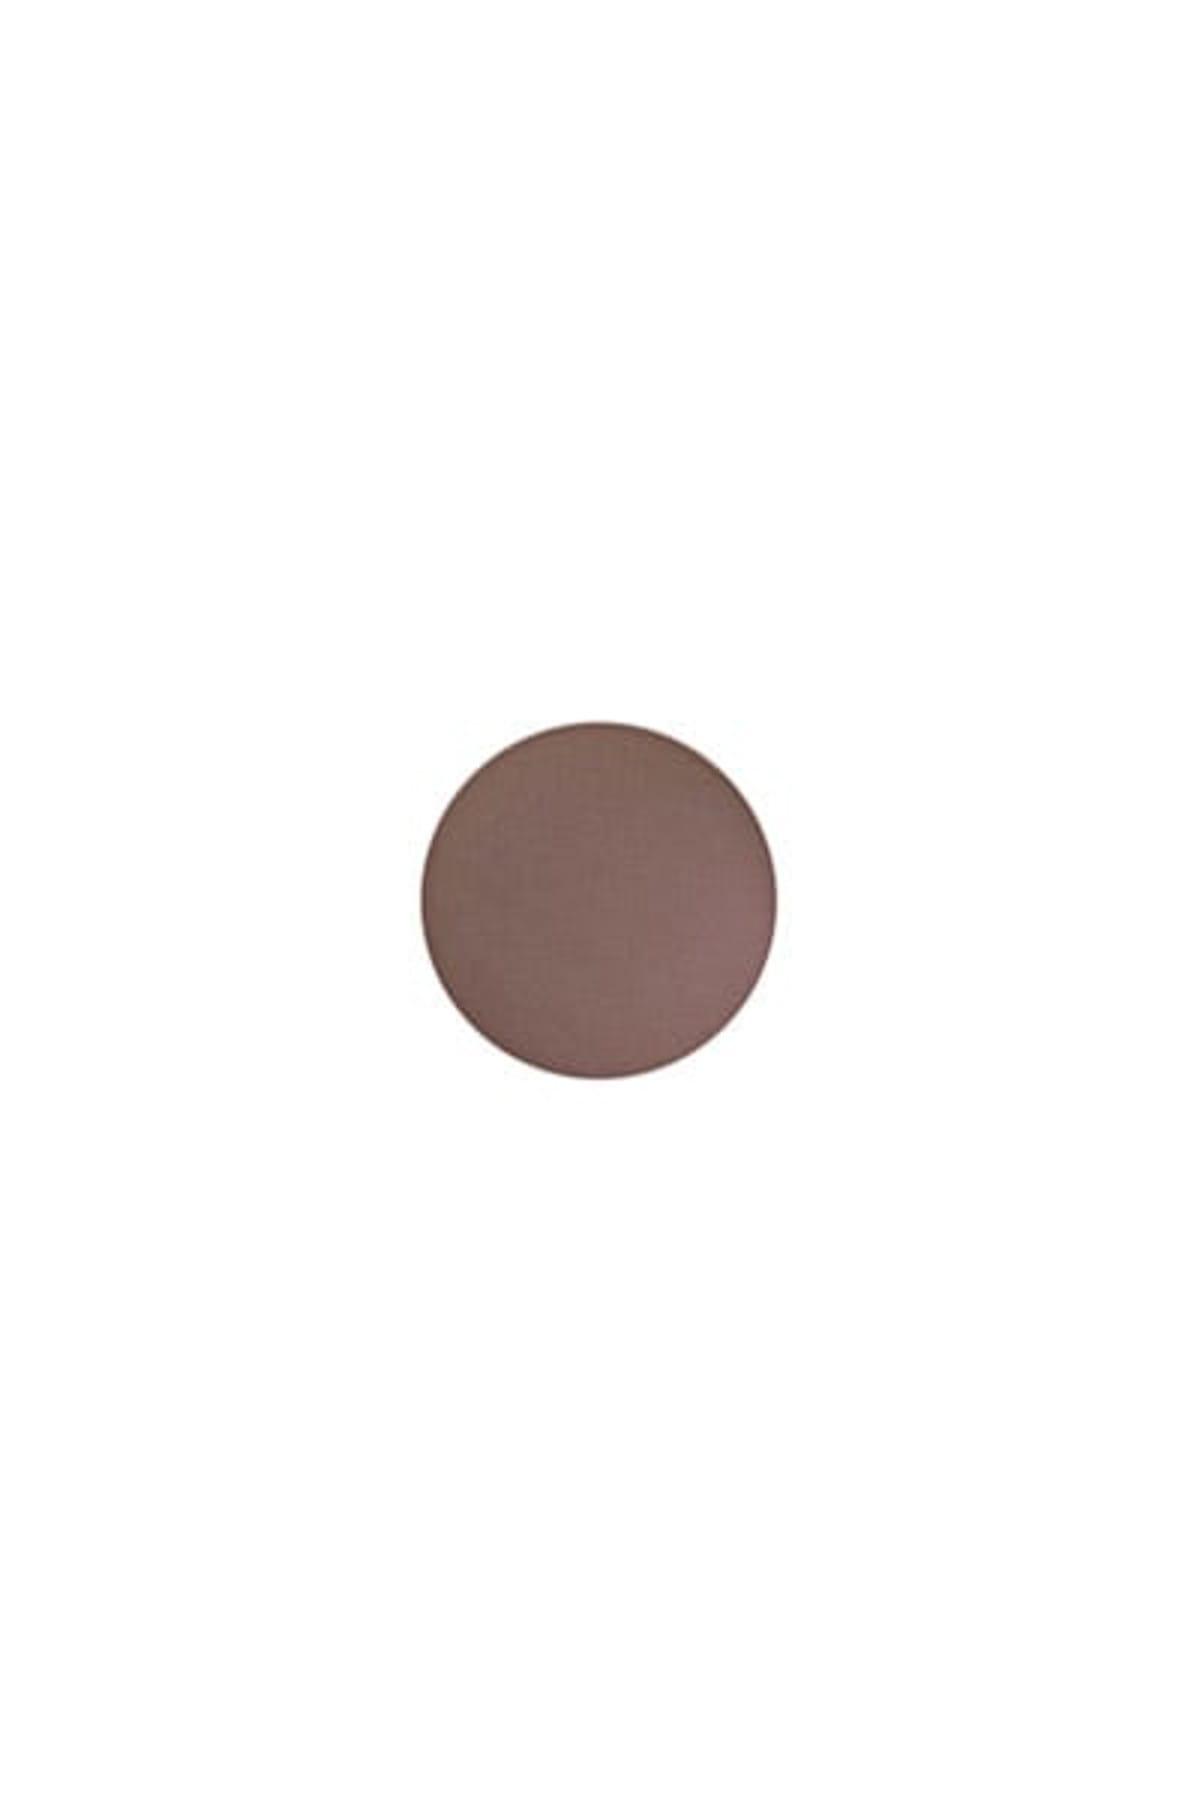 M.A.C Göz Farı - Refill Far Concrete 1.5 g 773602961559 1